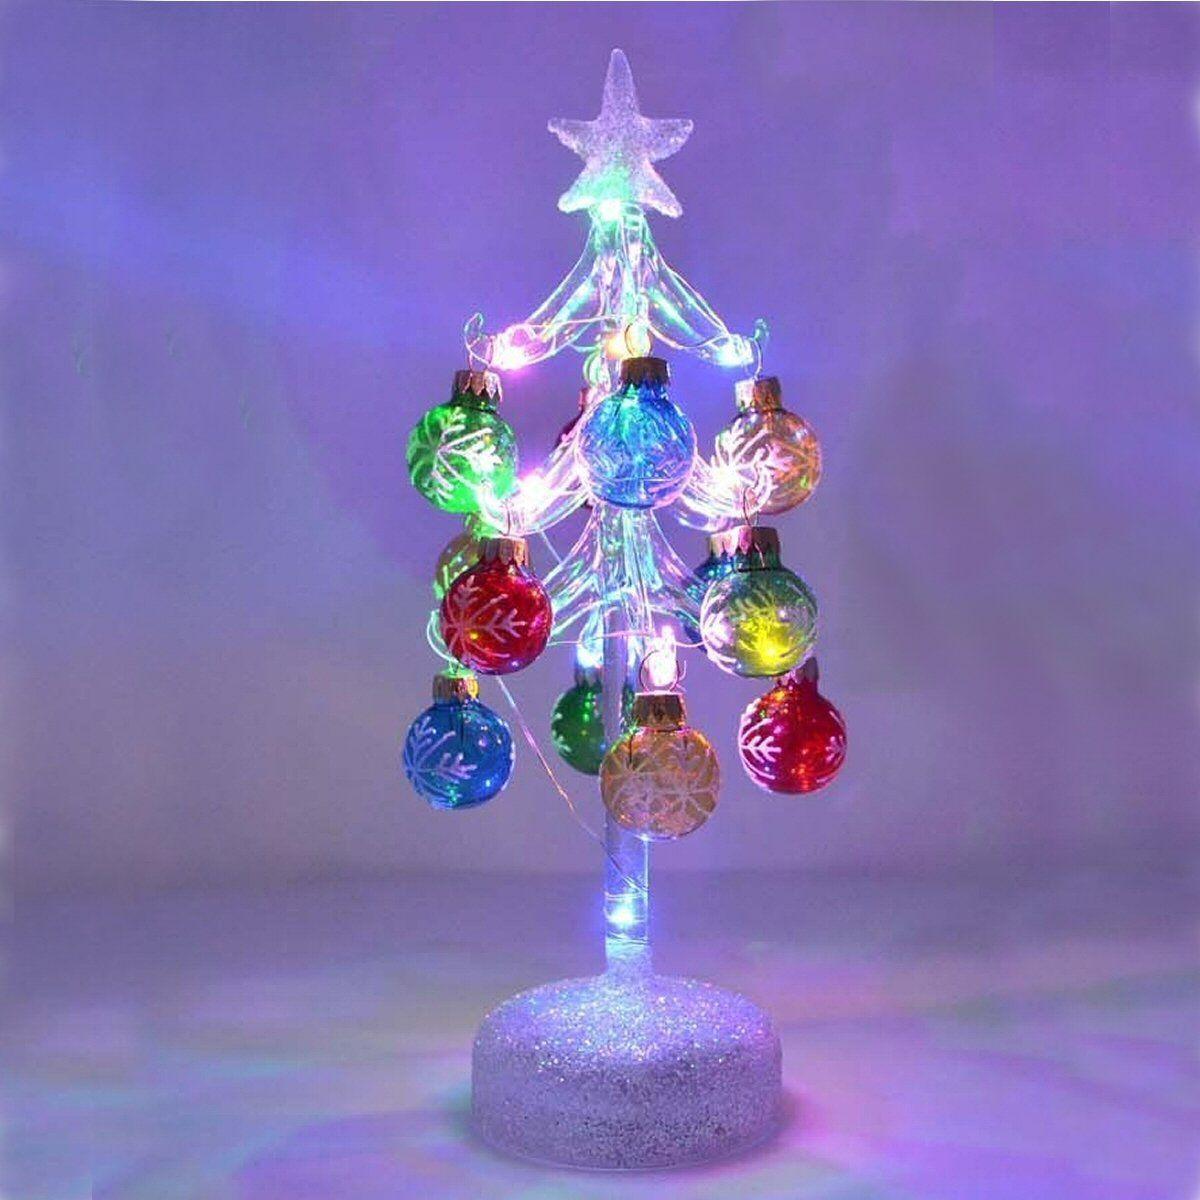 Pin On Miniature Glass Christmas Trees